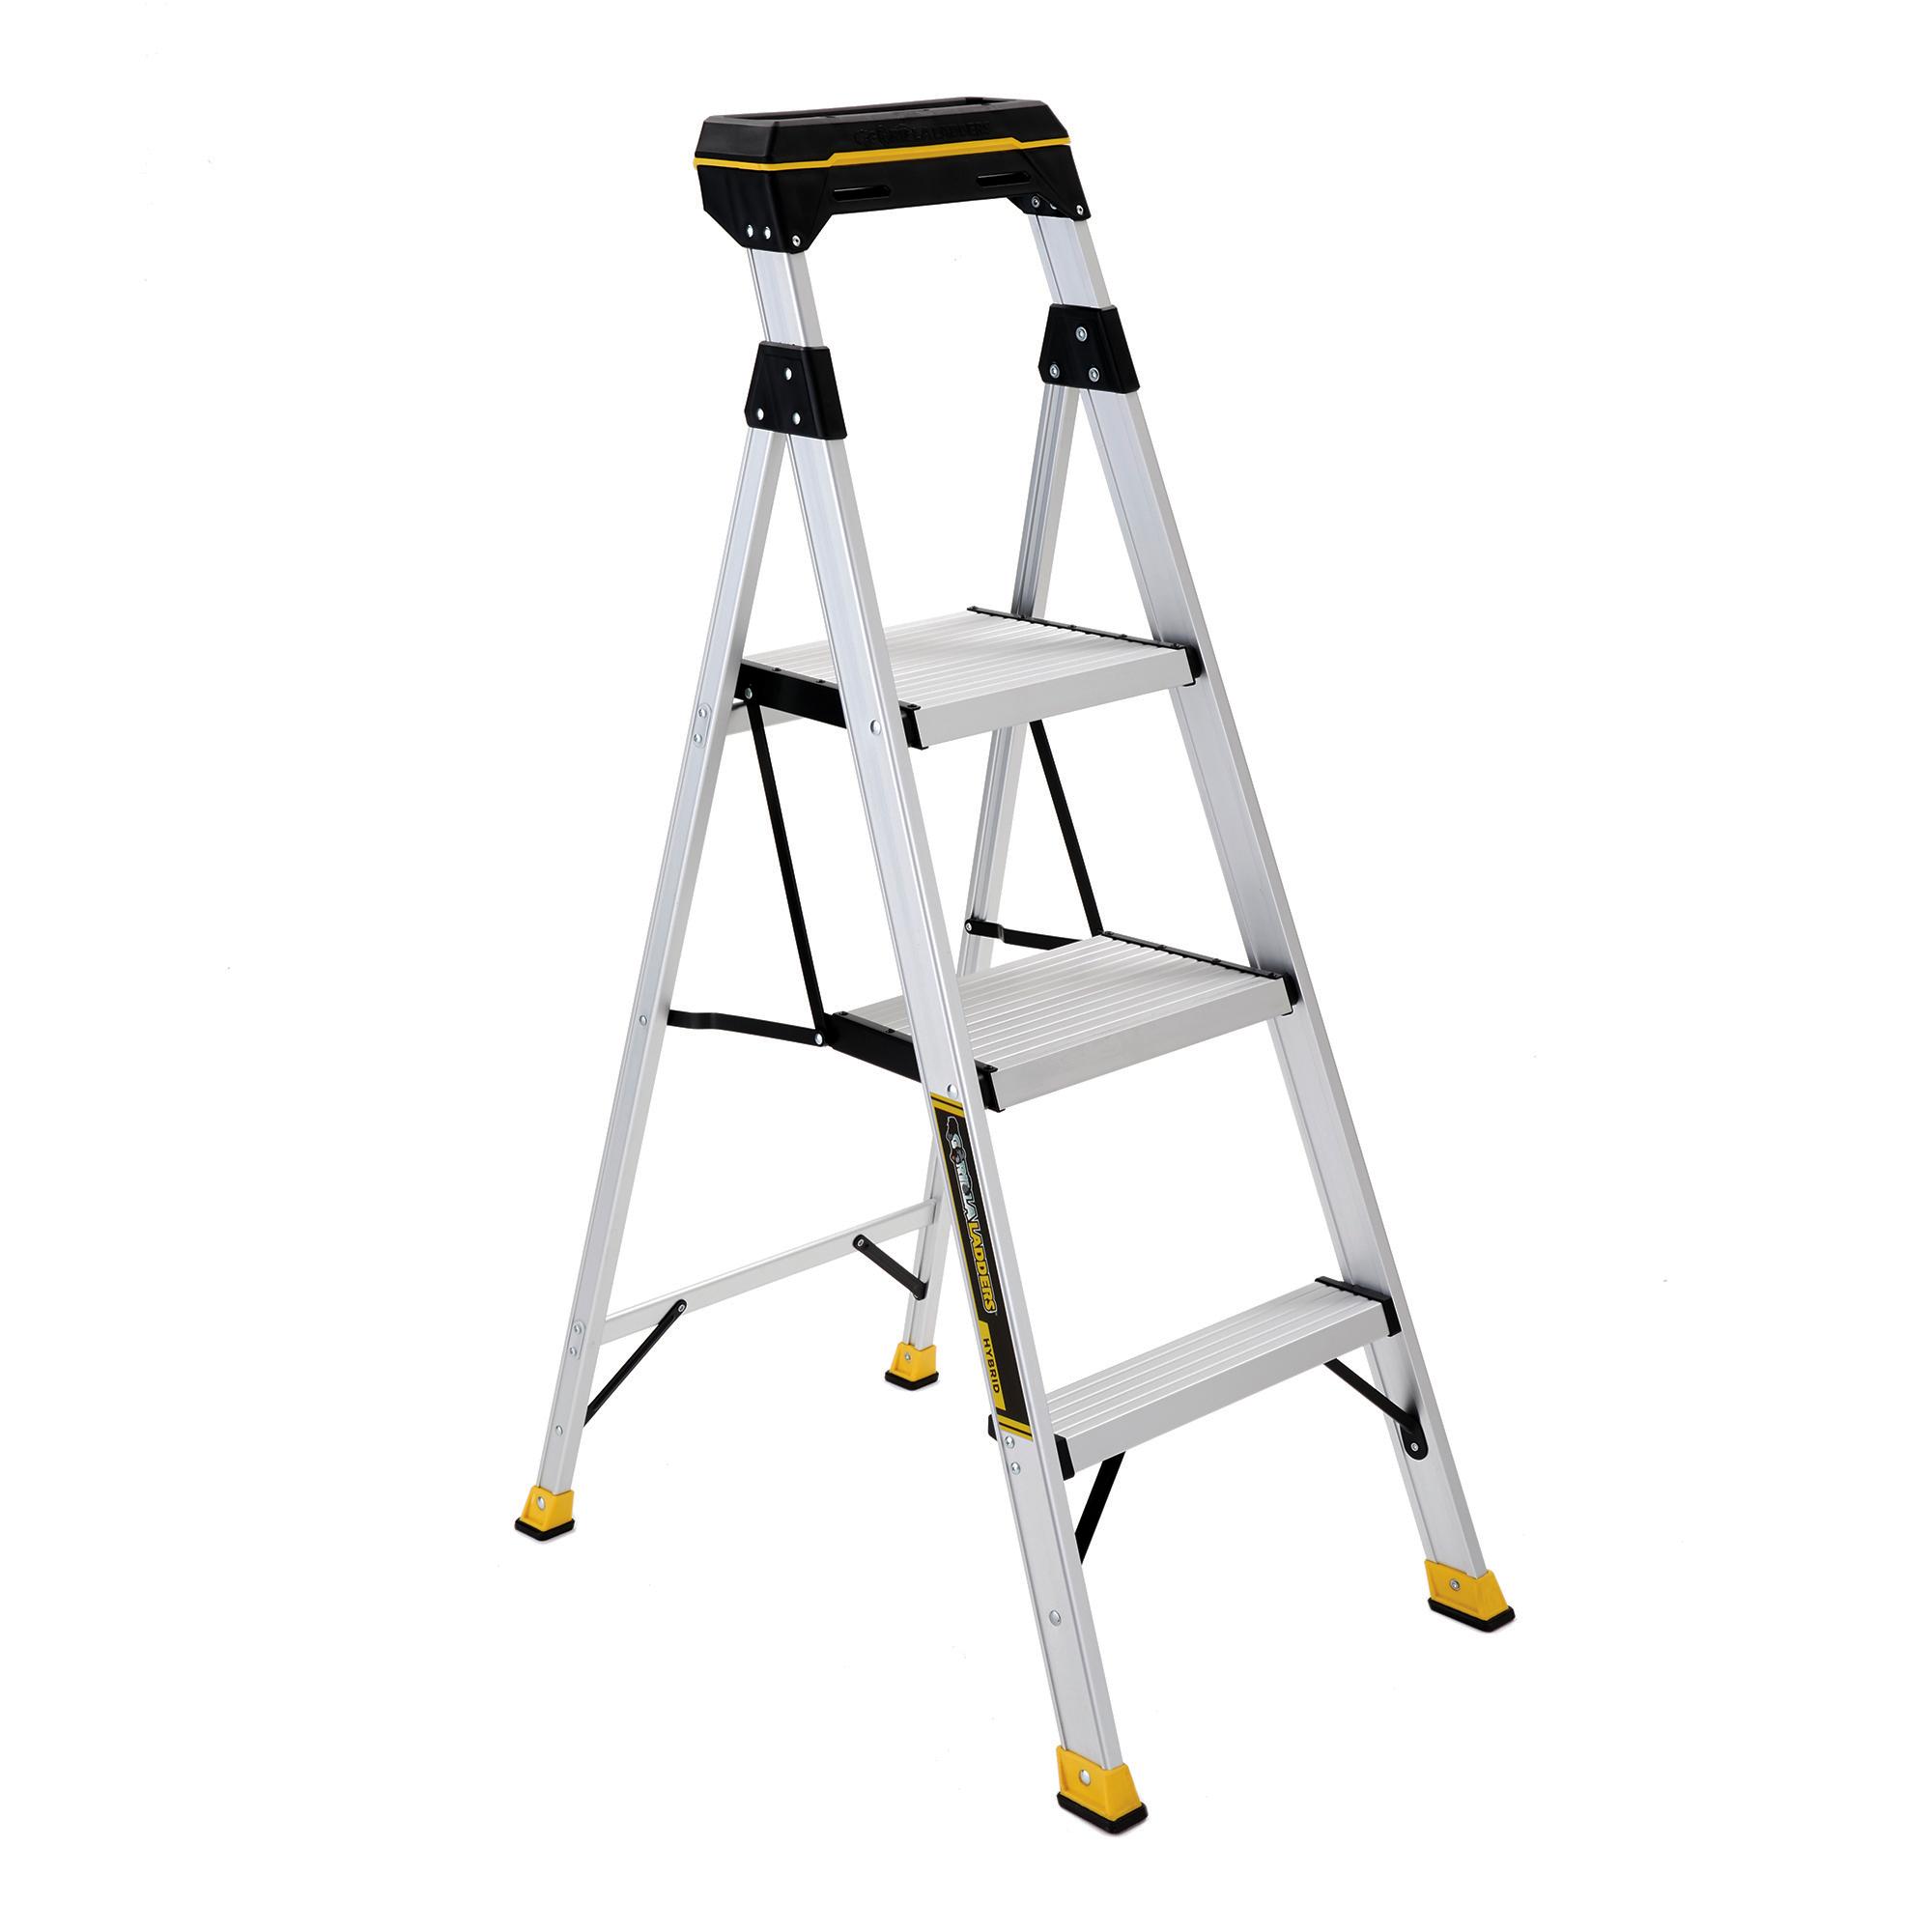 Gorilla Laddersgla 4xt Gorilla Ladders